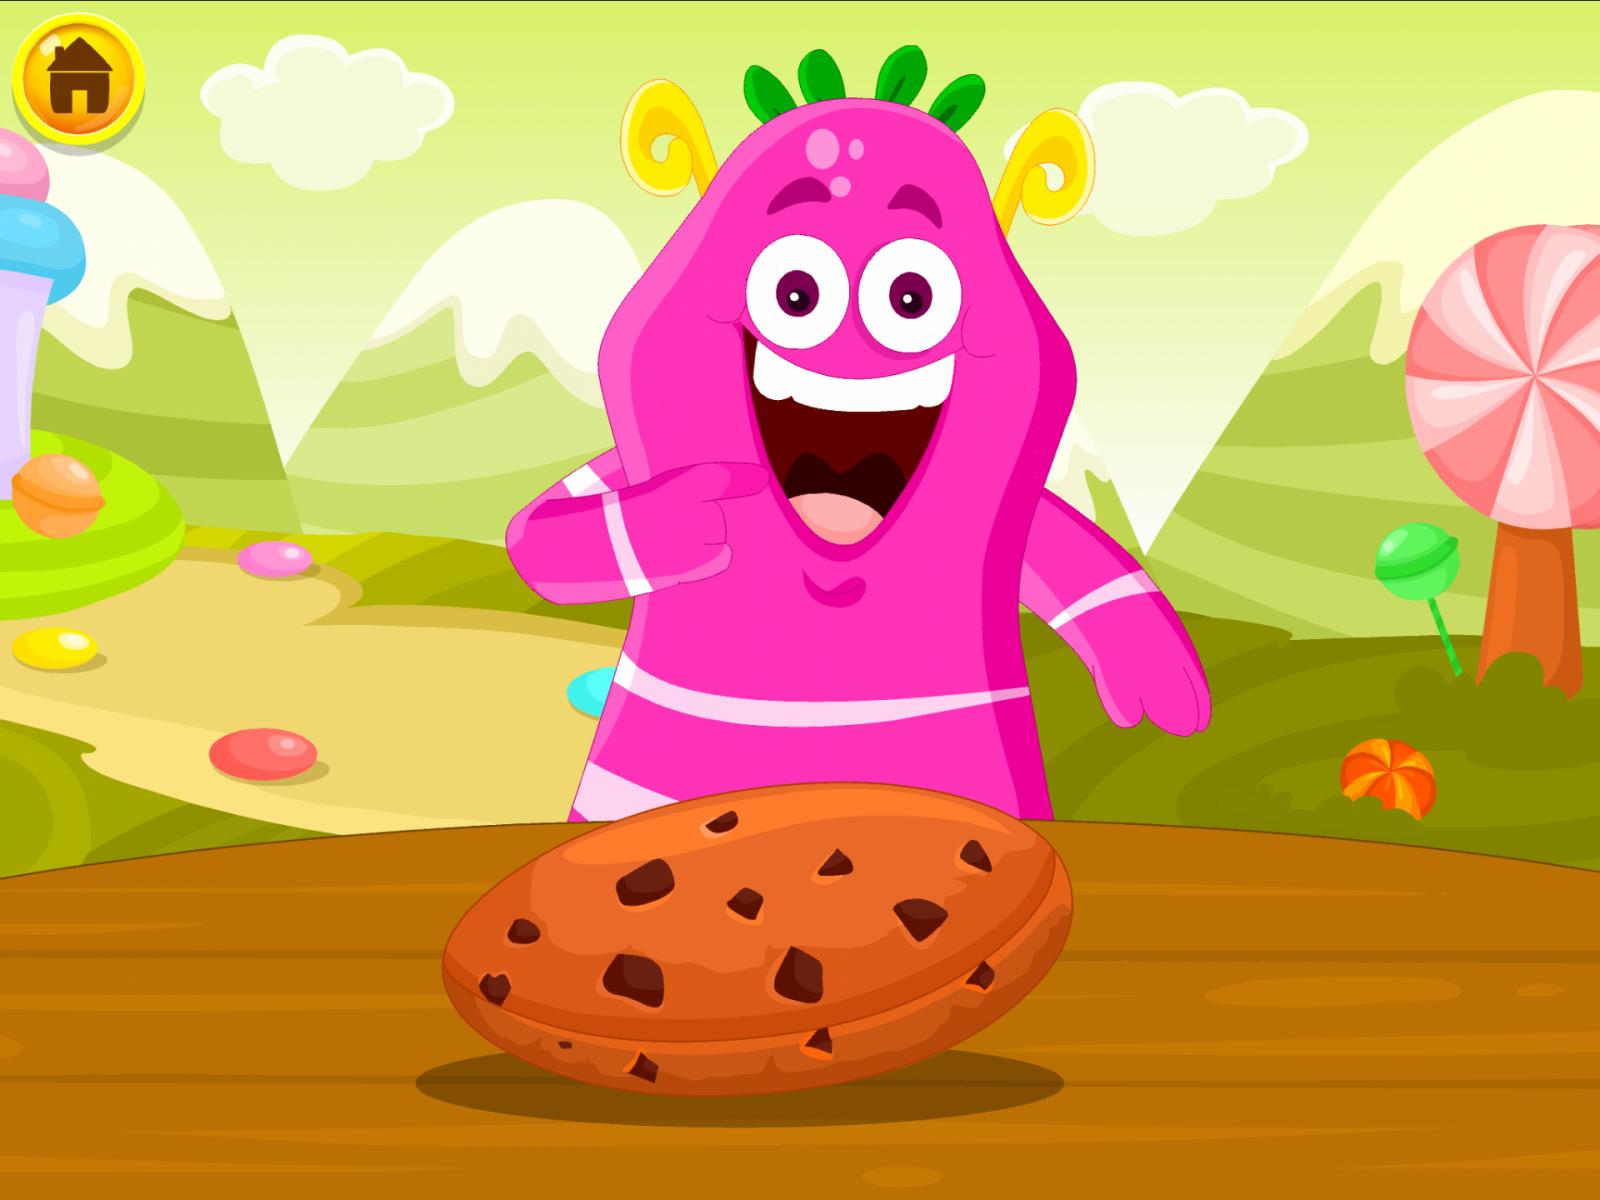 KidloLand Nursery Rhymes App Review and Giveaway